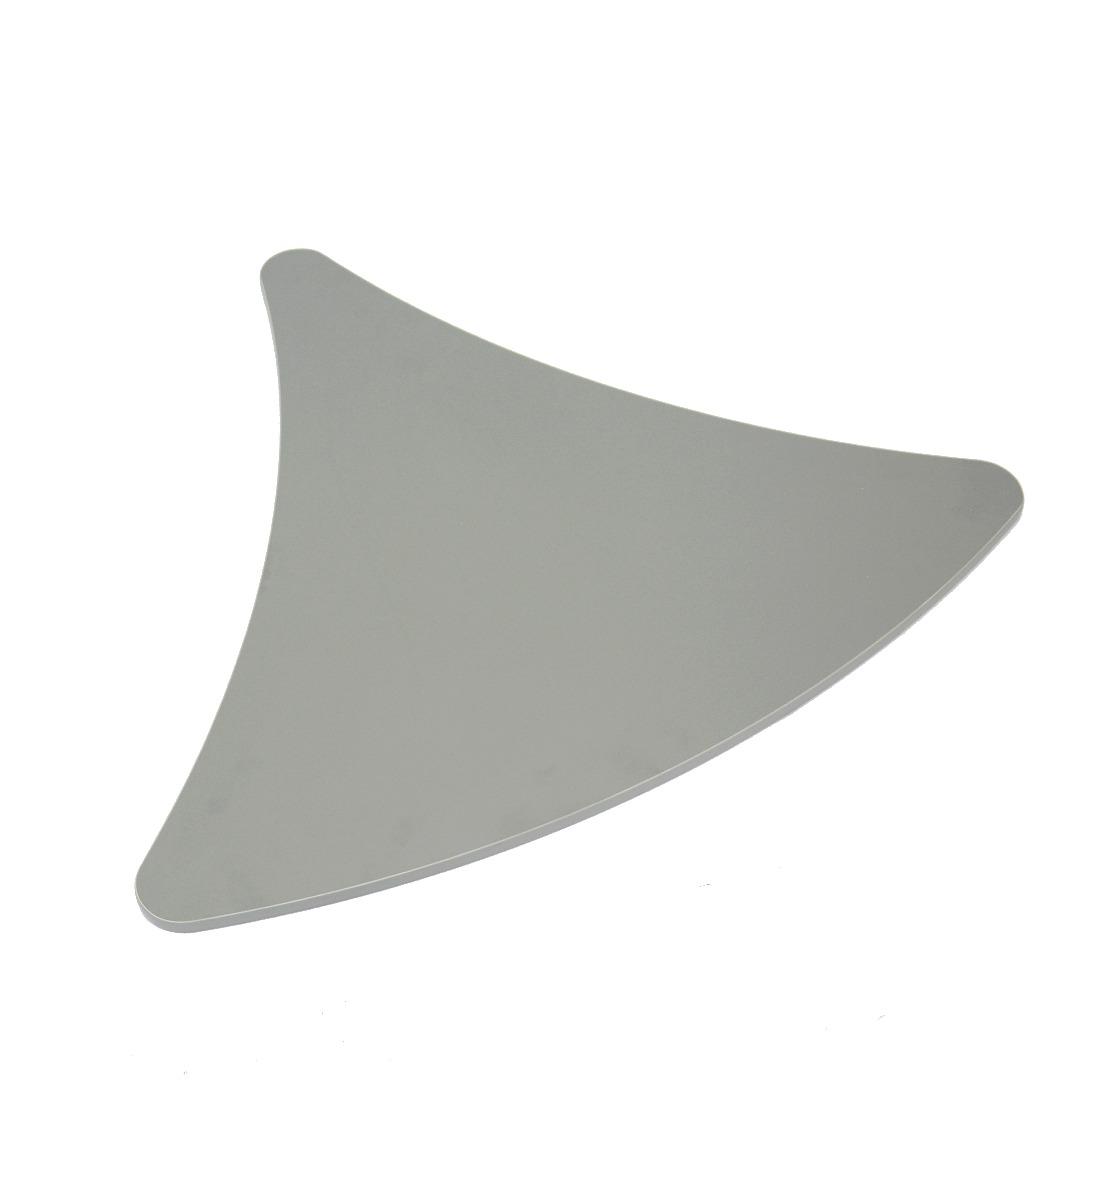 Dreieckstheke Curved - Thekenplatte